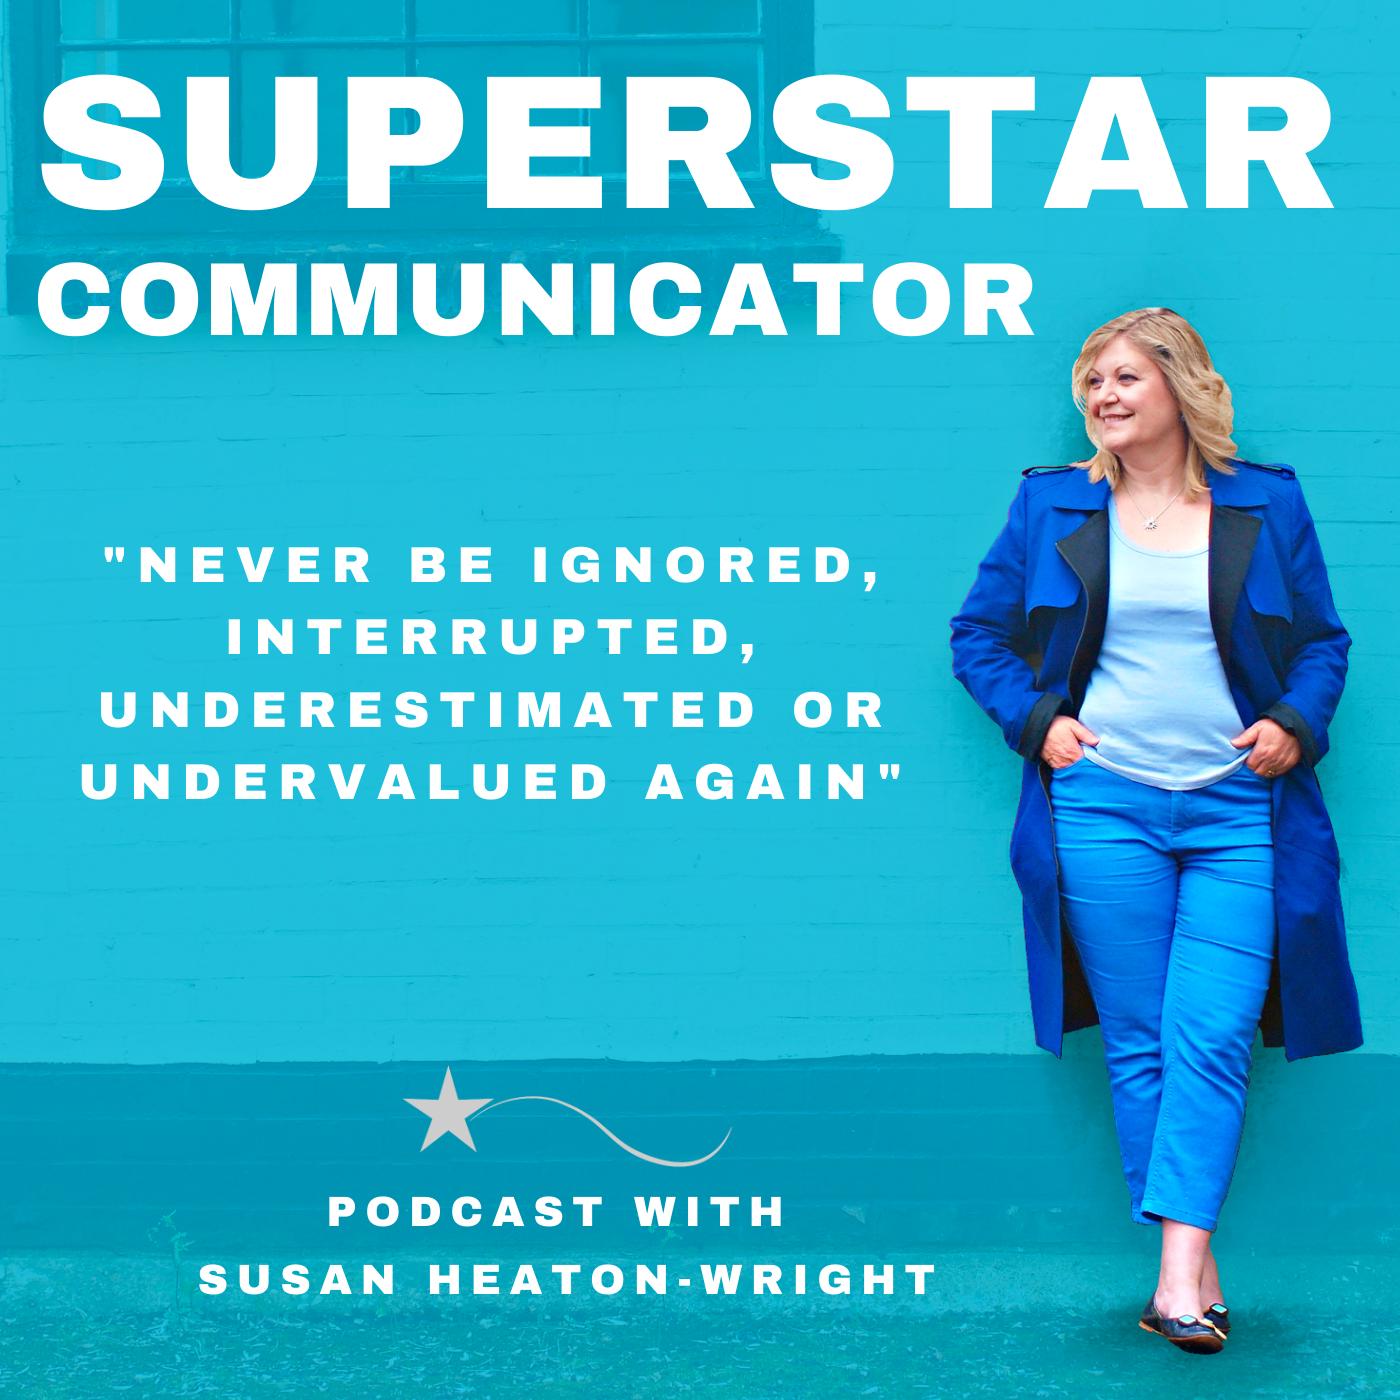 Superstar Communicator podcast show art